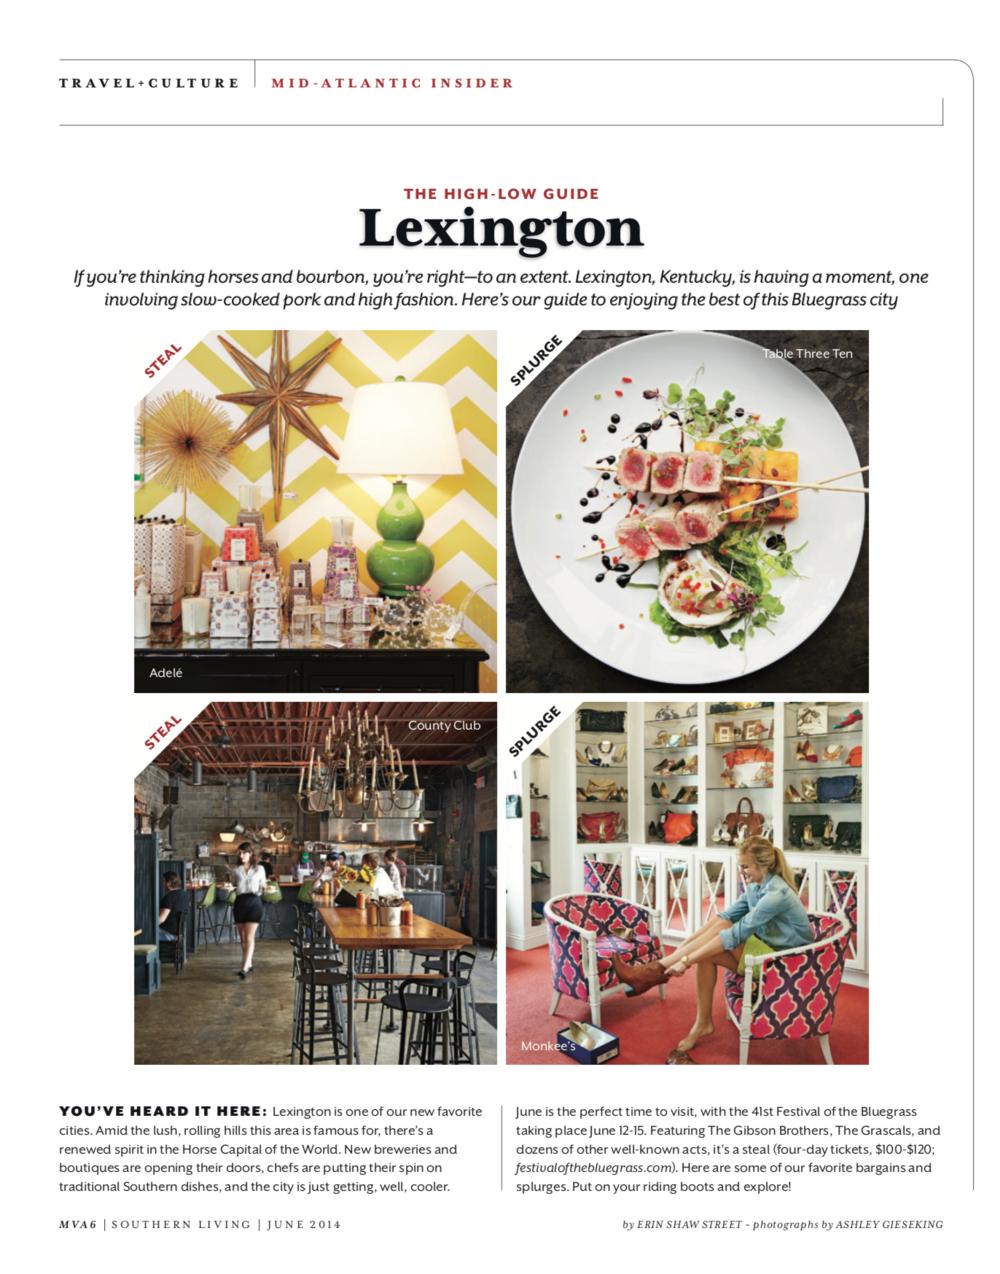 The High-Low Guide: Lexington